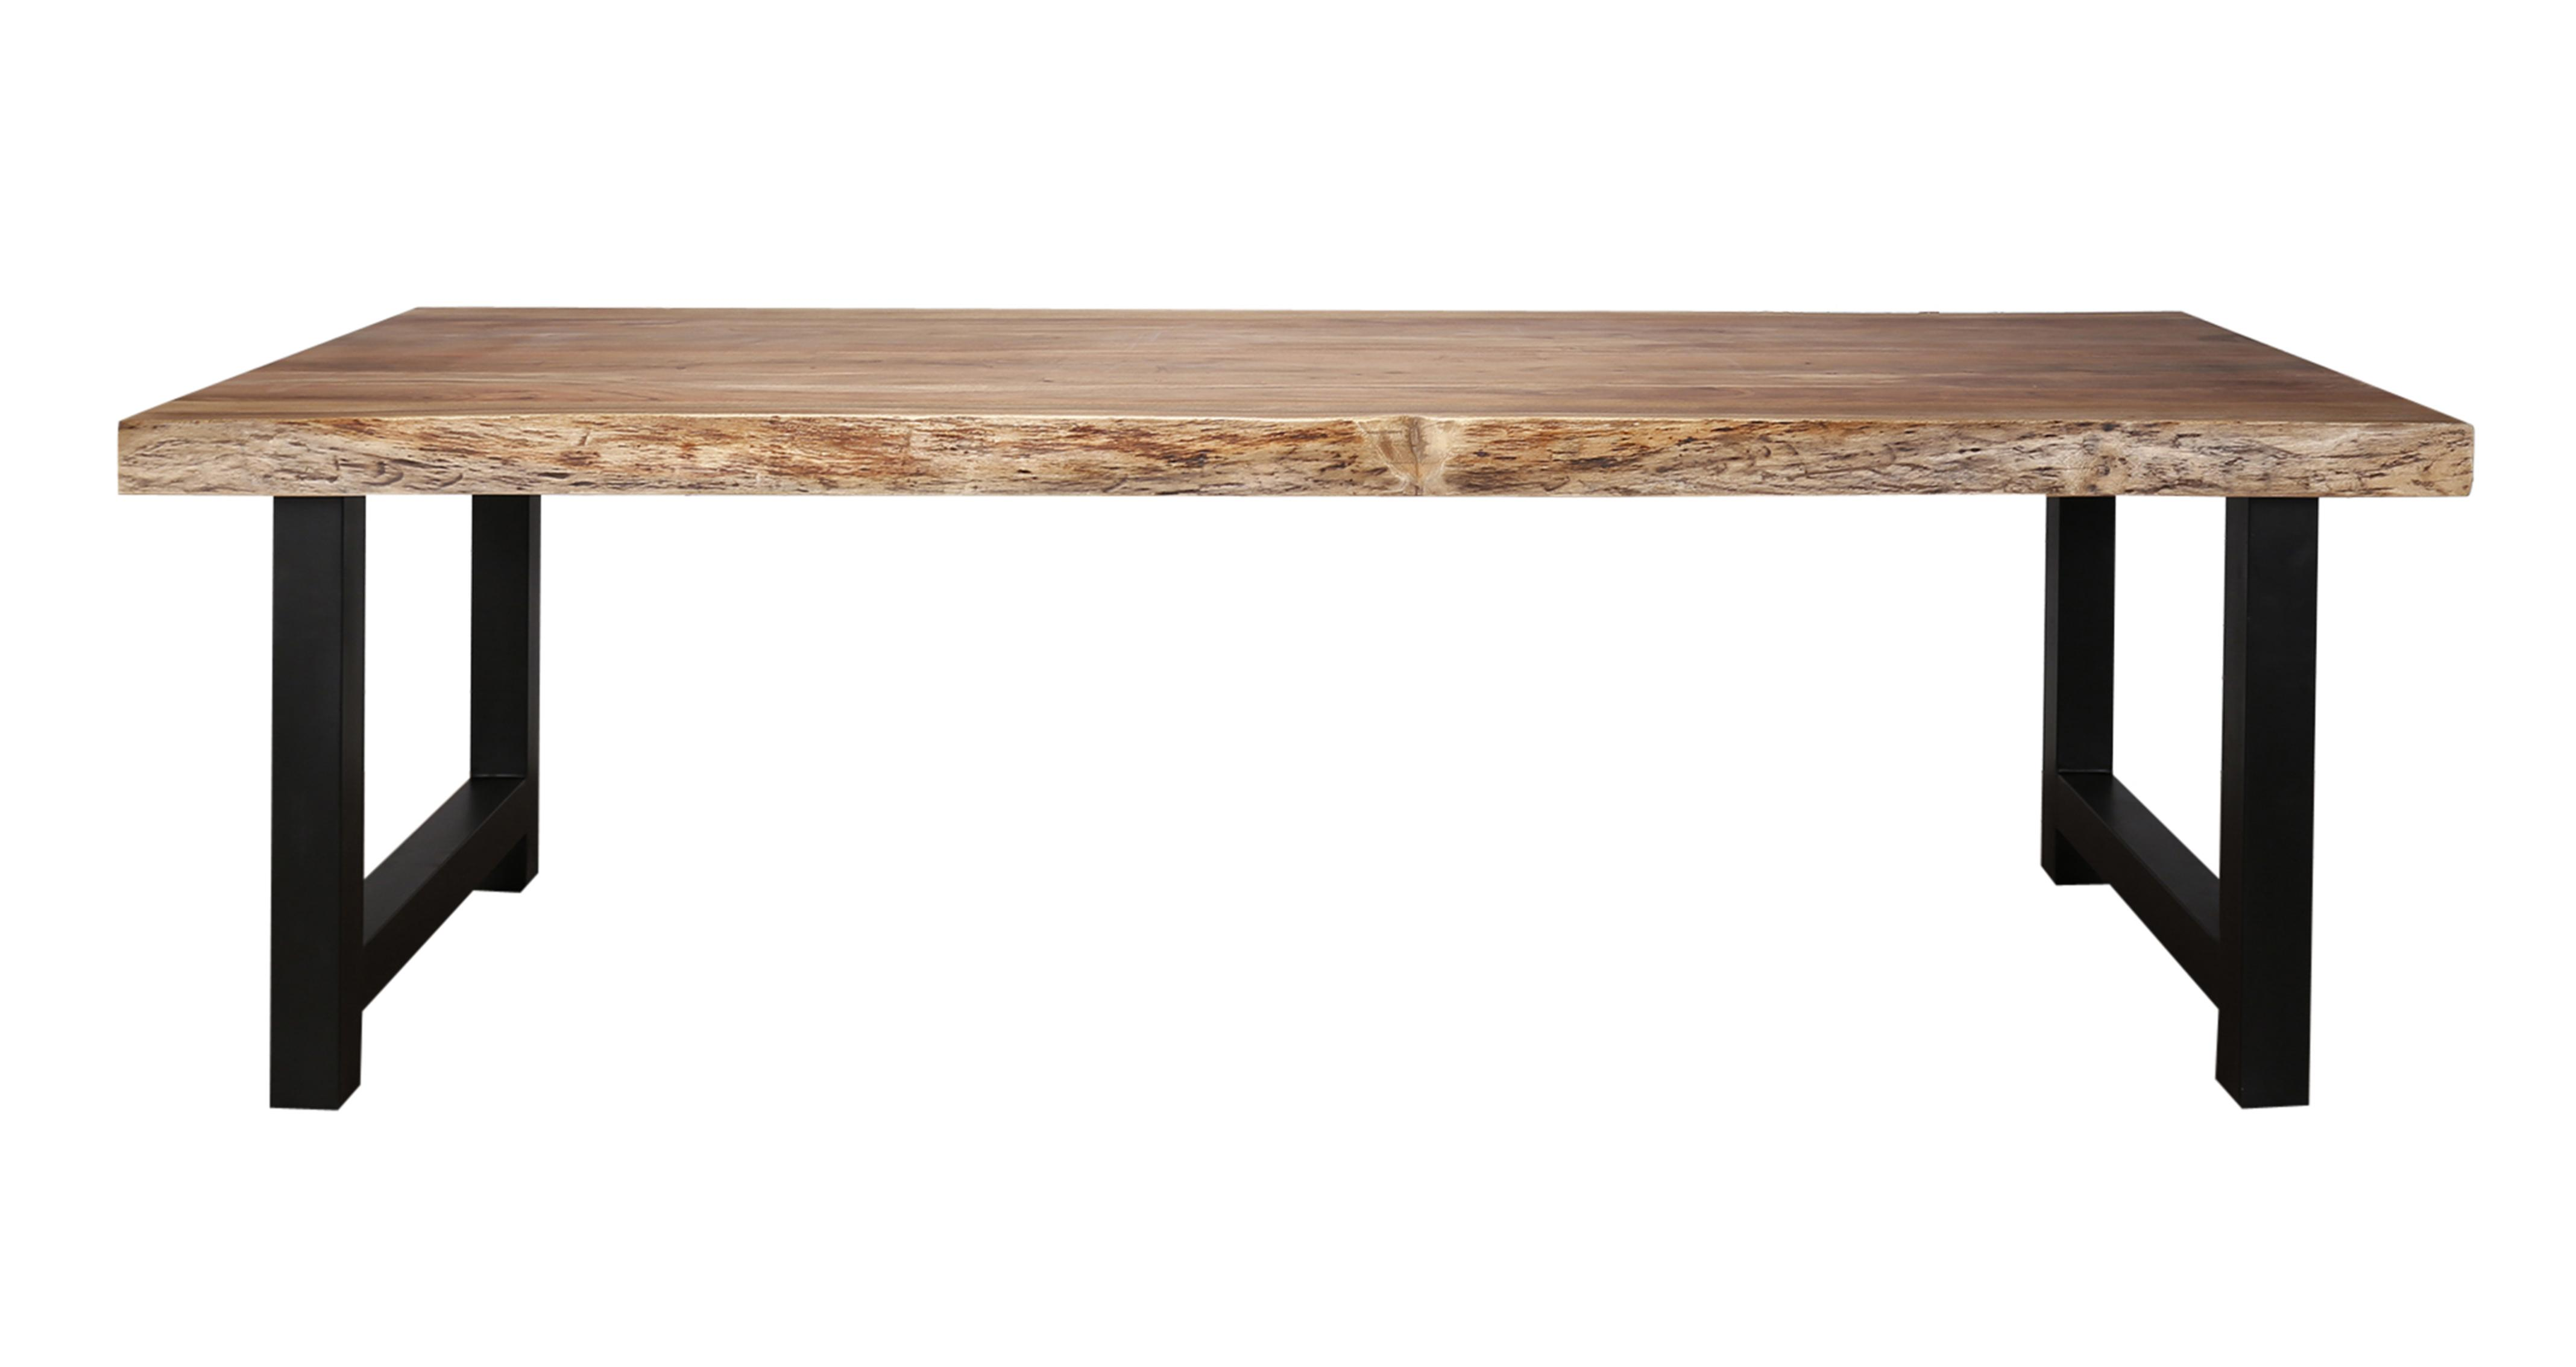 Hedendaags Leyte Vaste eettafel 200cm | DFS Banken GV-73